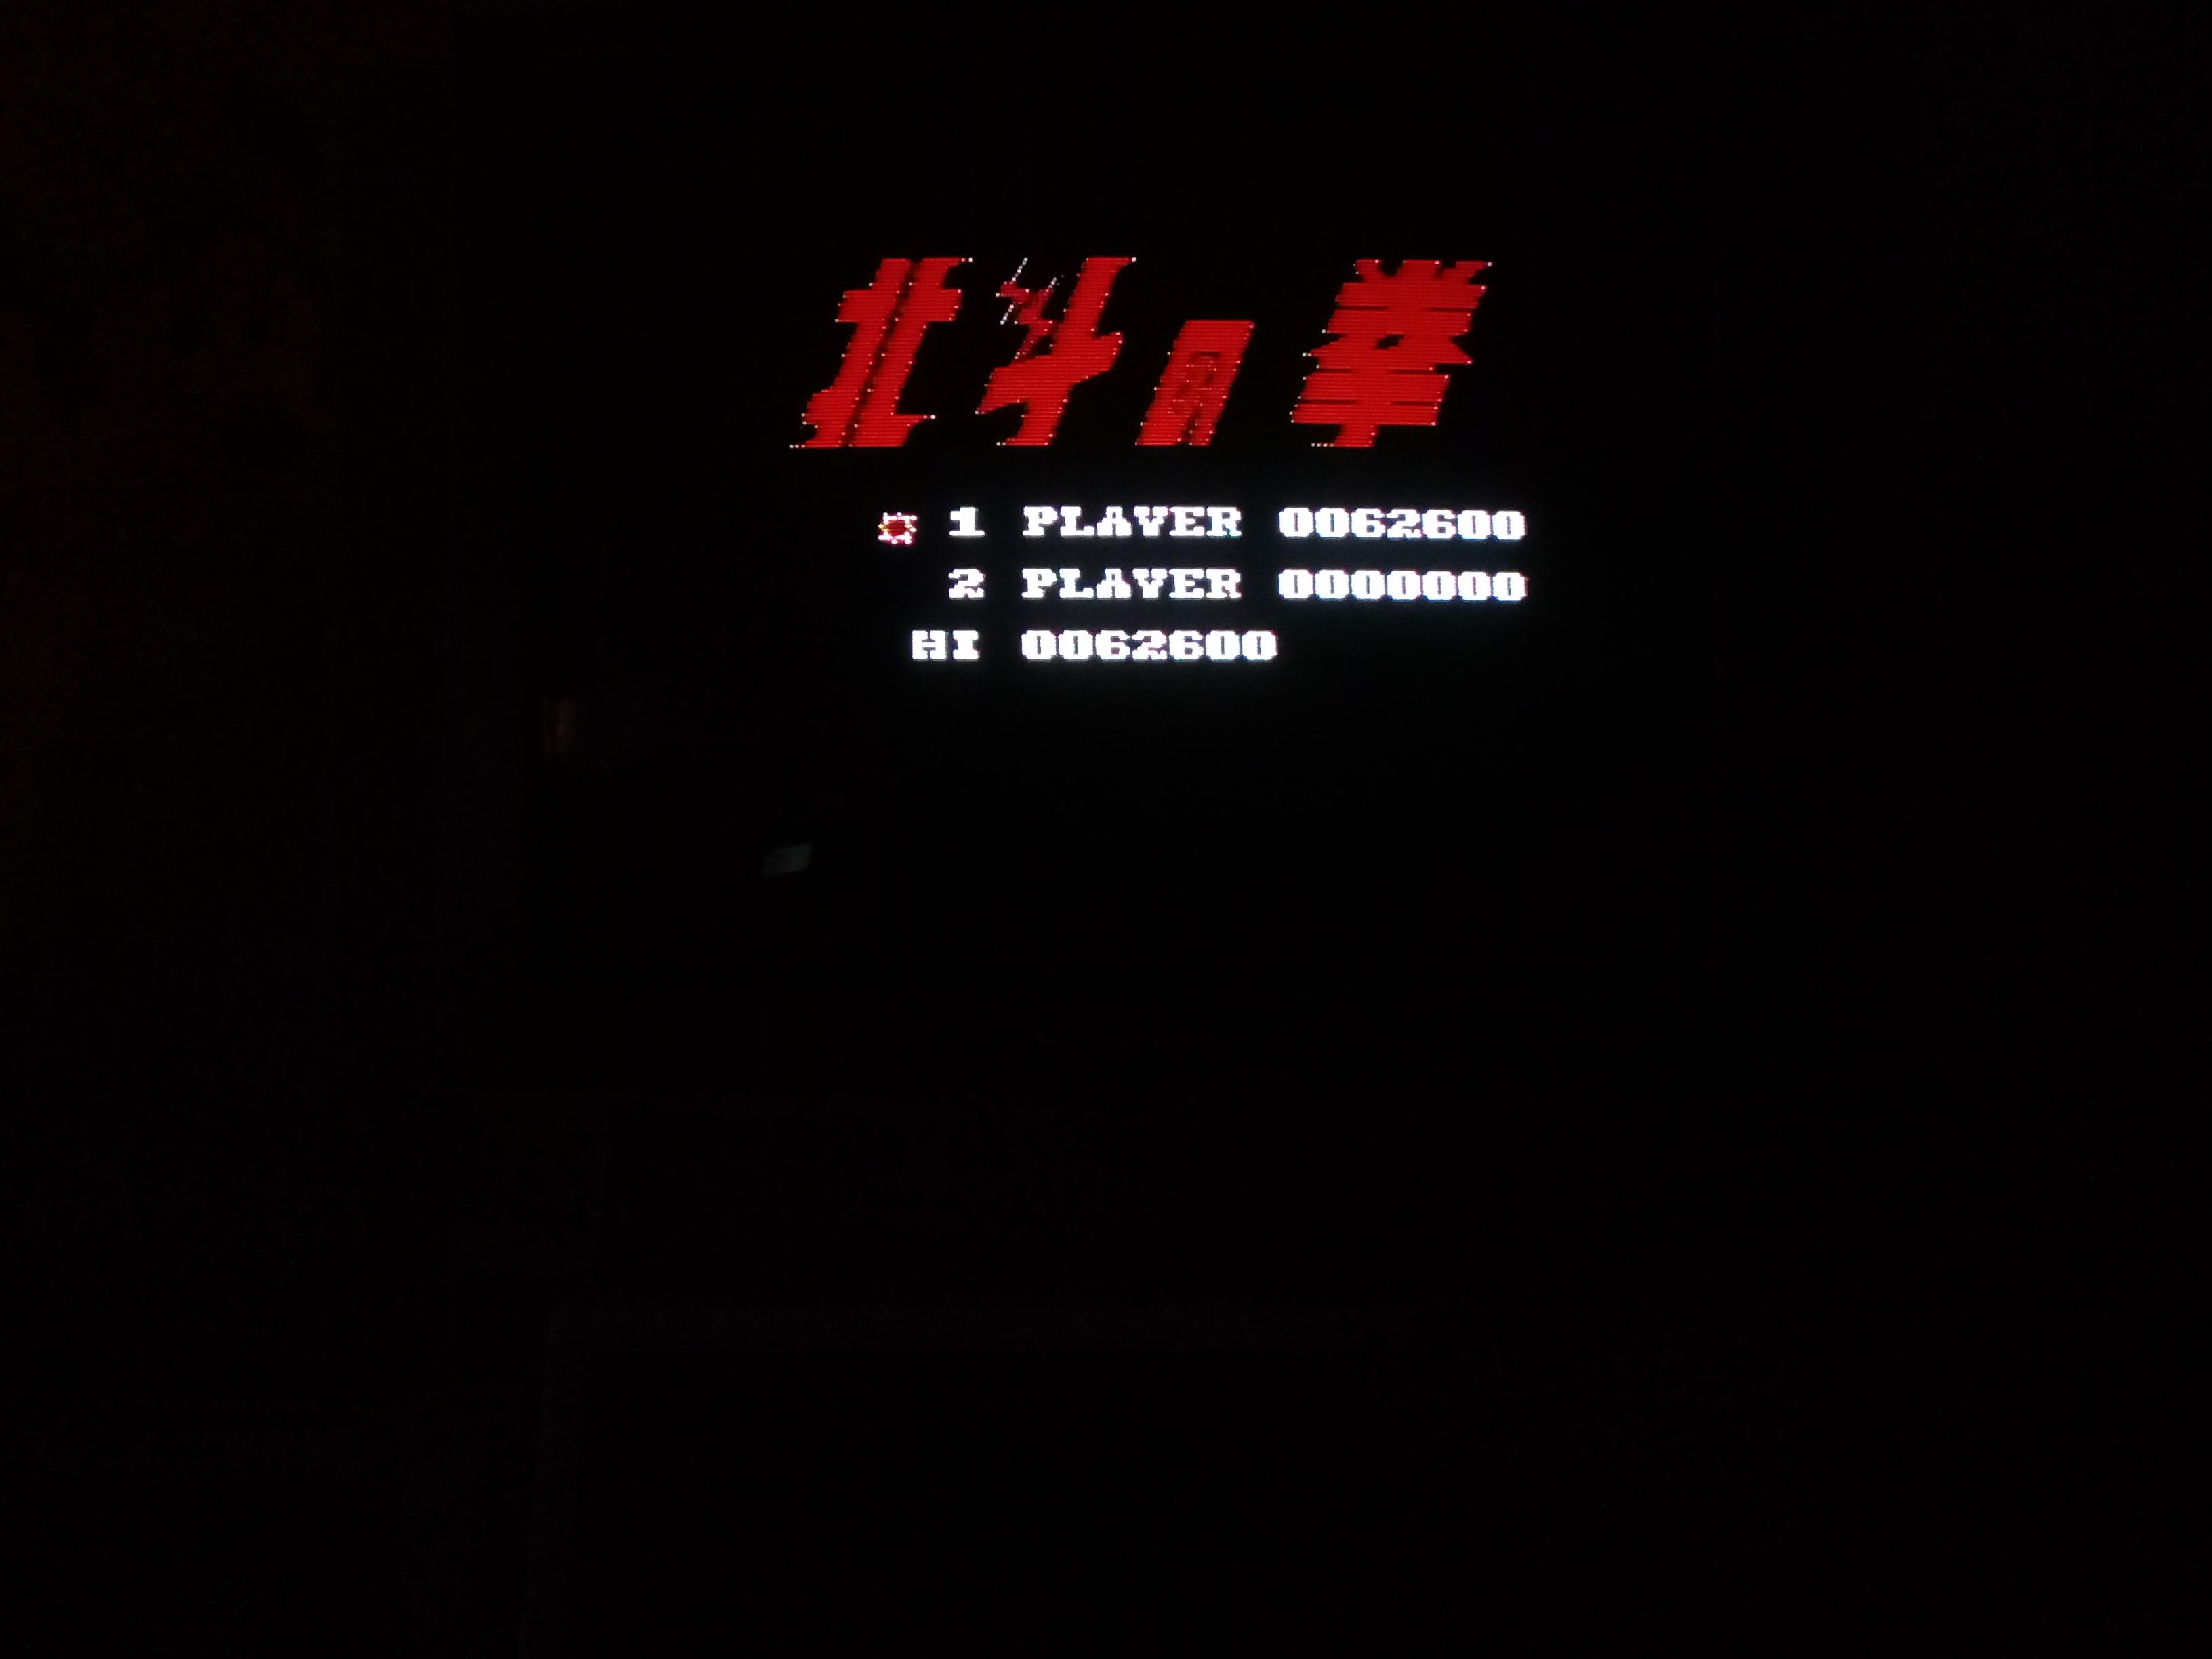 omargeddon: Hokuto no Ken (NES/Famicom) 62,600 points on 2019-04-16 19:02:41